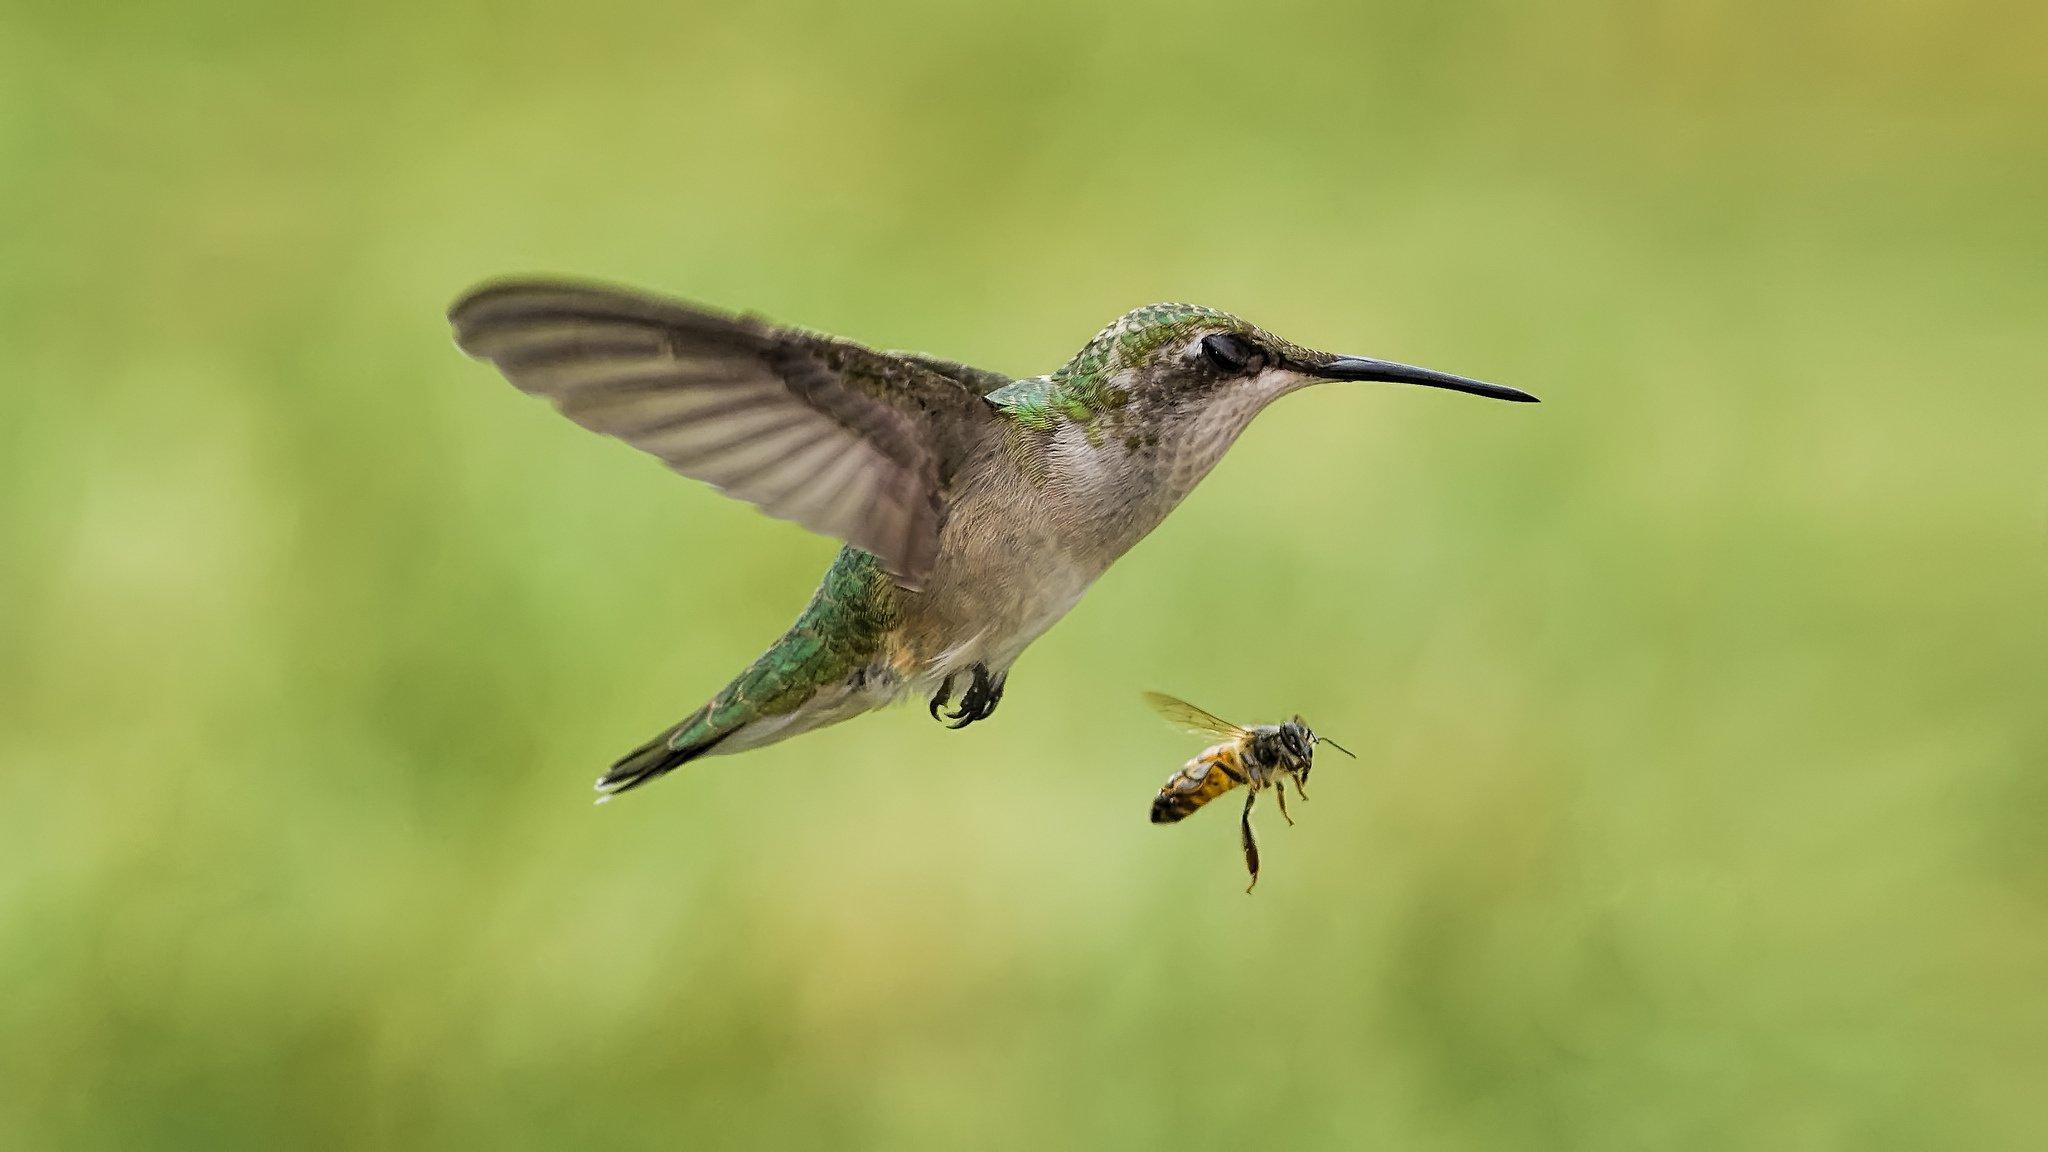 hummingbird wallpaper hd